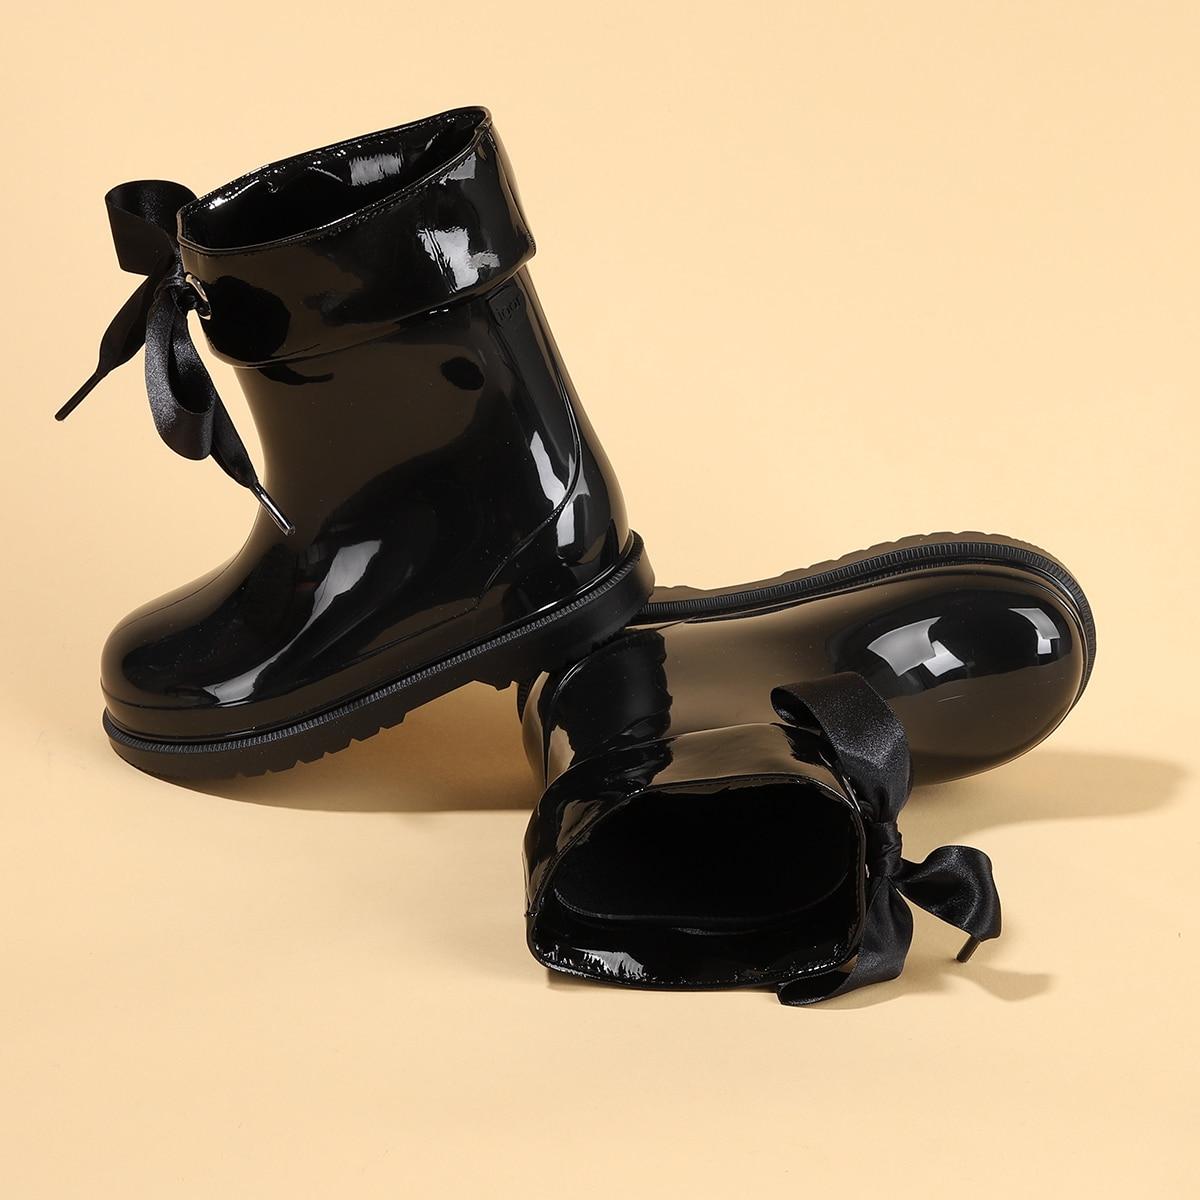 İgor W10238 Bimbi Lazo Female Child Waterproof Rain Snow Boot enlarge